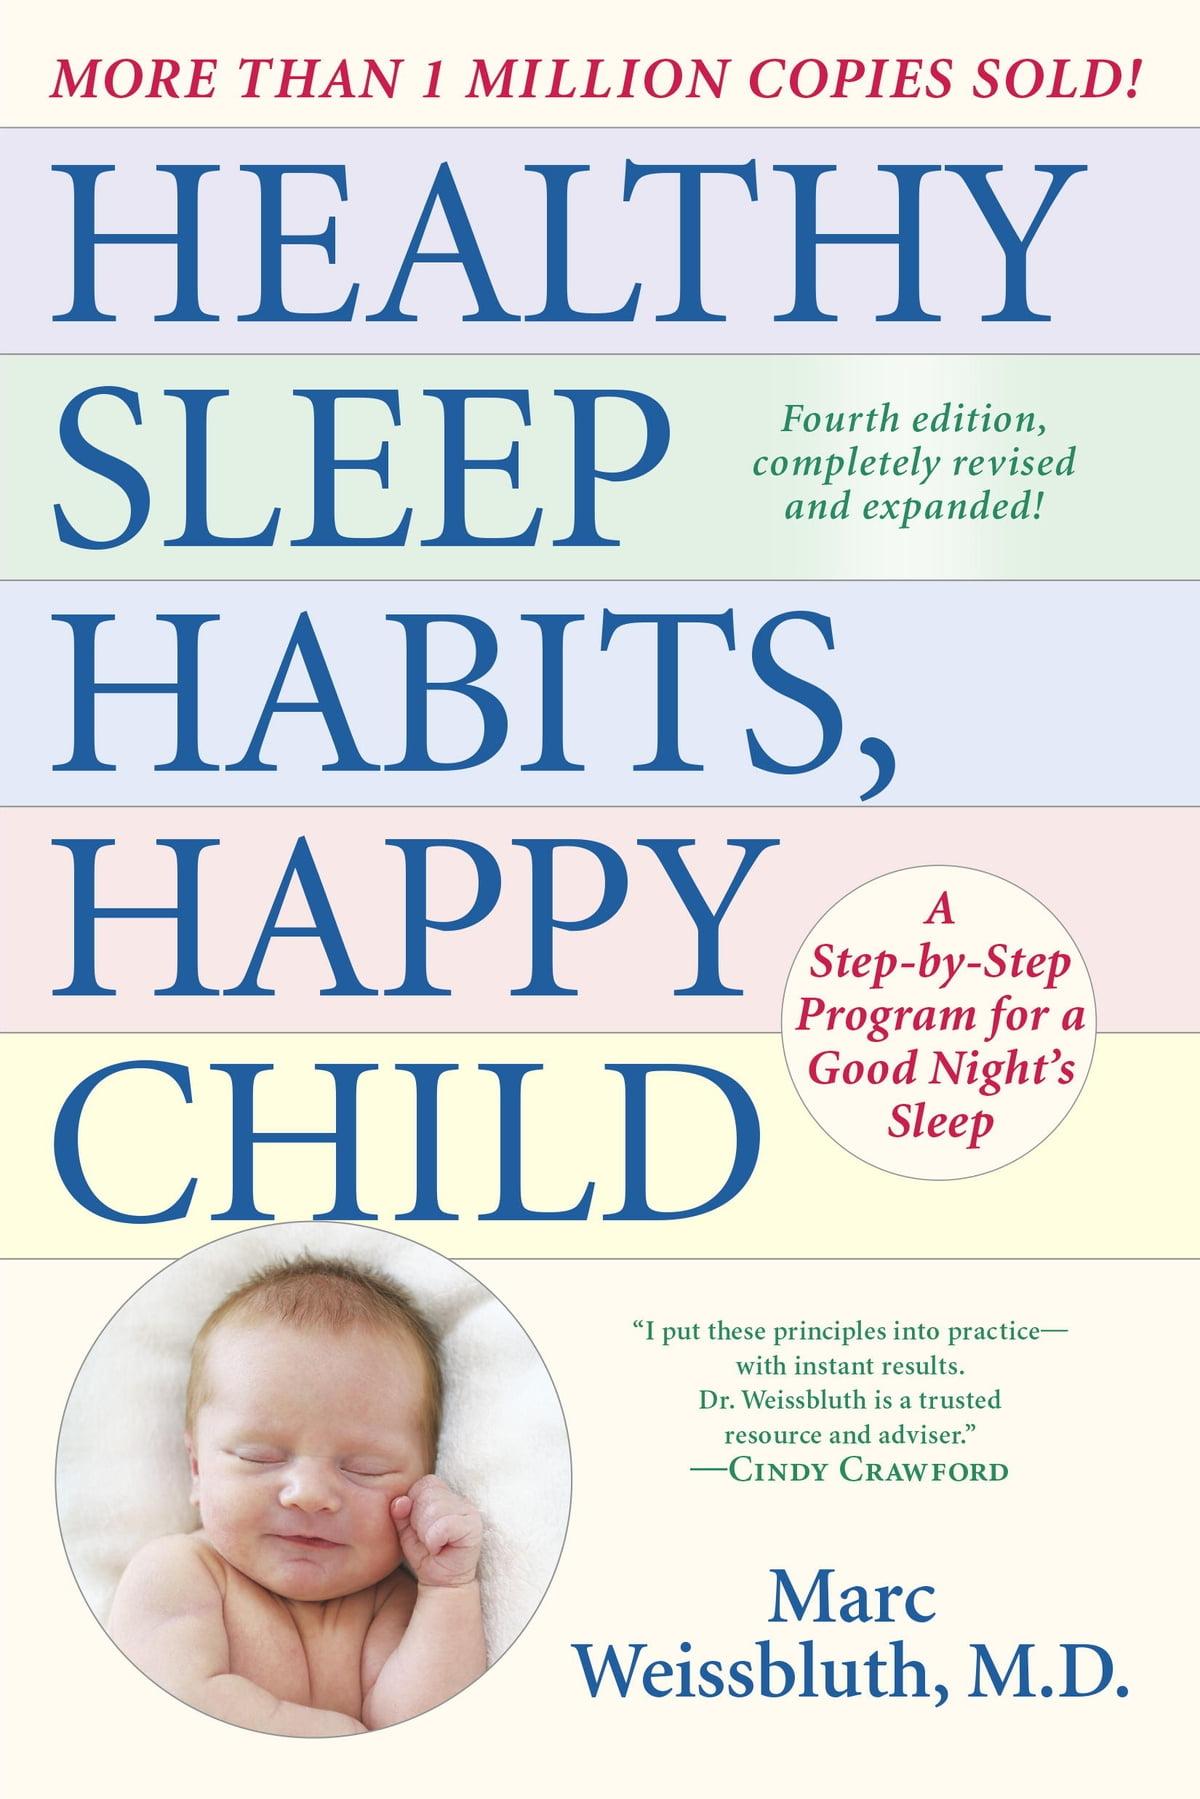 Healthy Sleep Habits Happy Child 4th Edition Ebook By